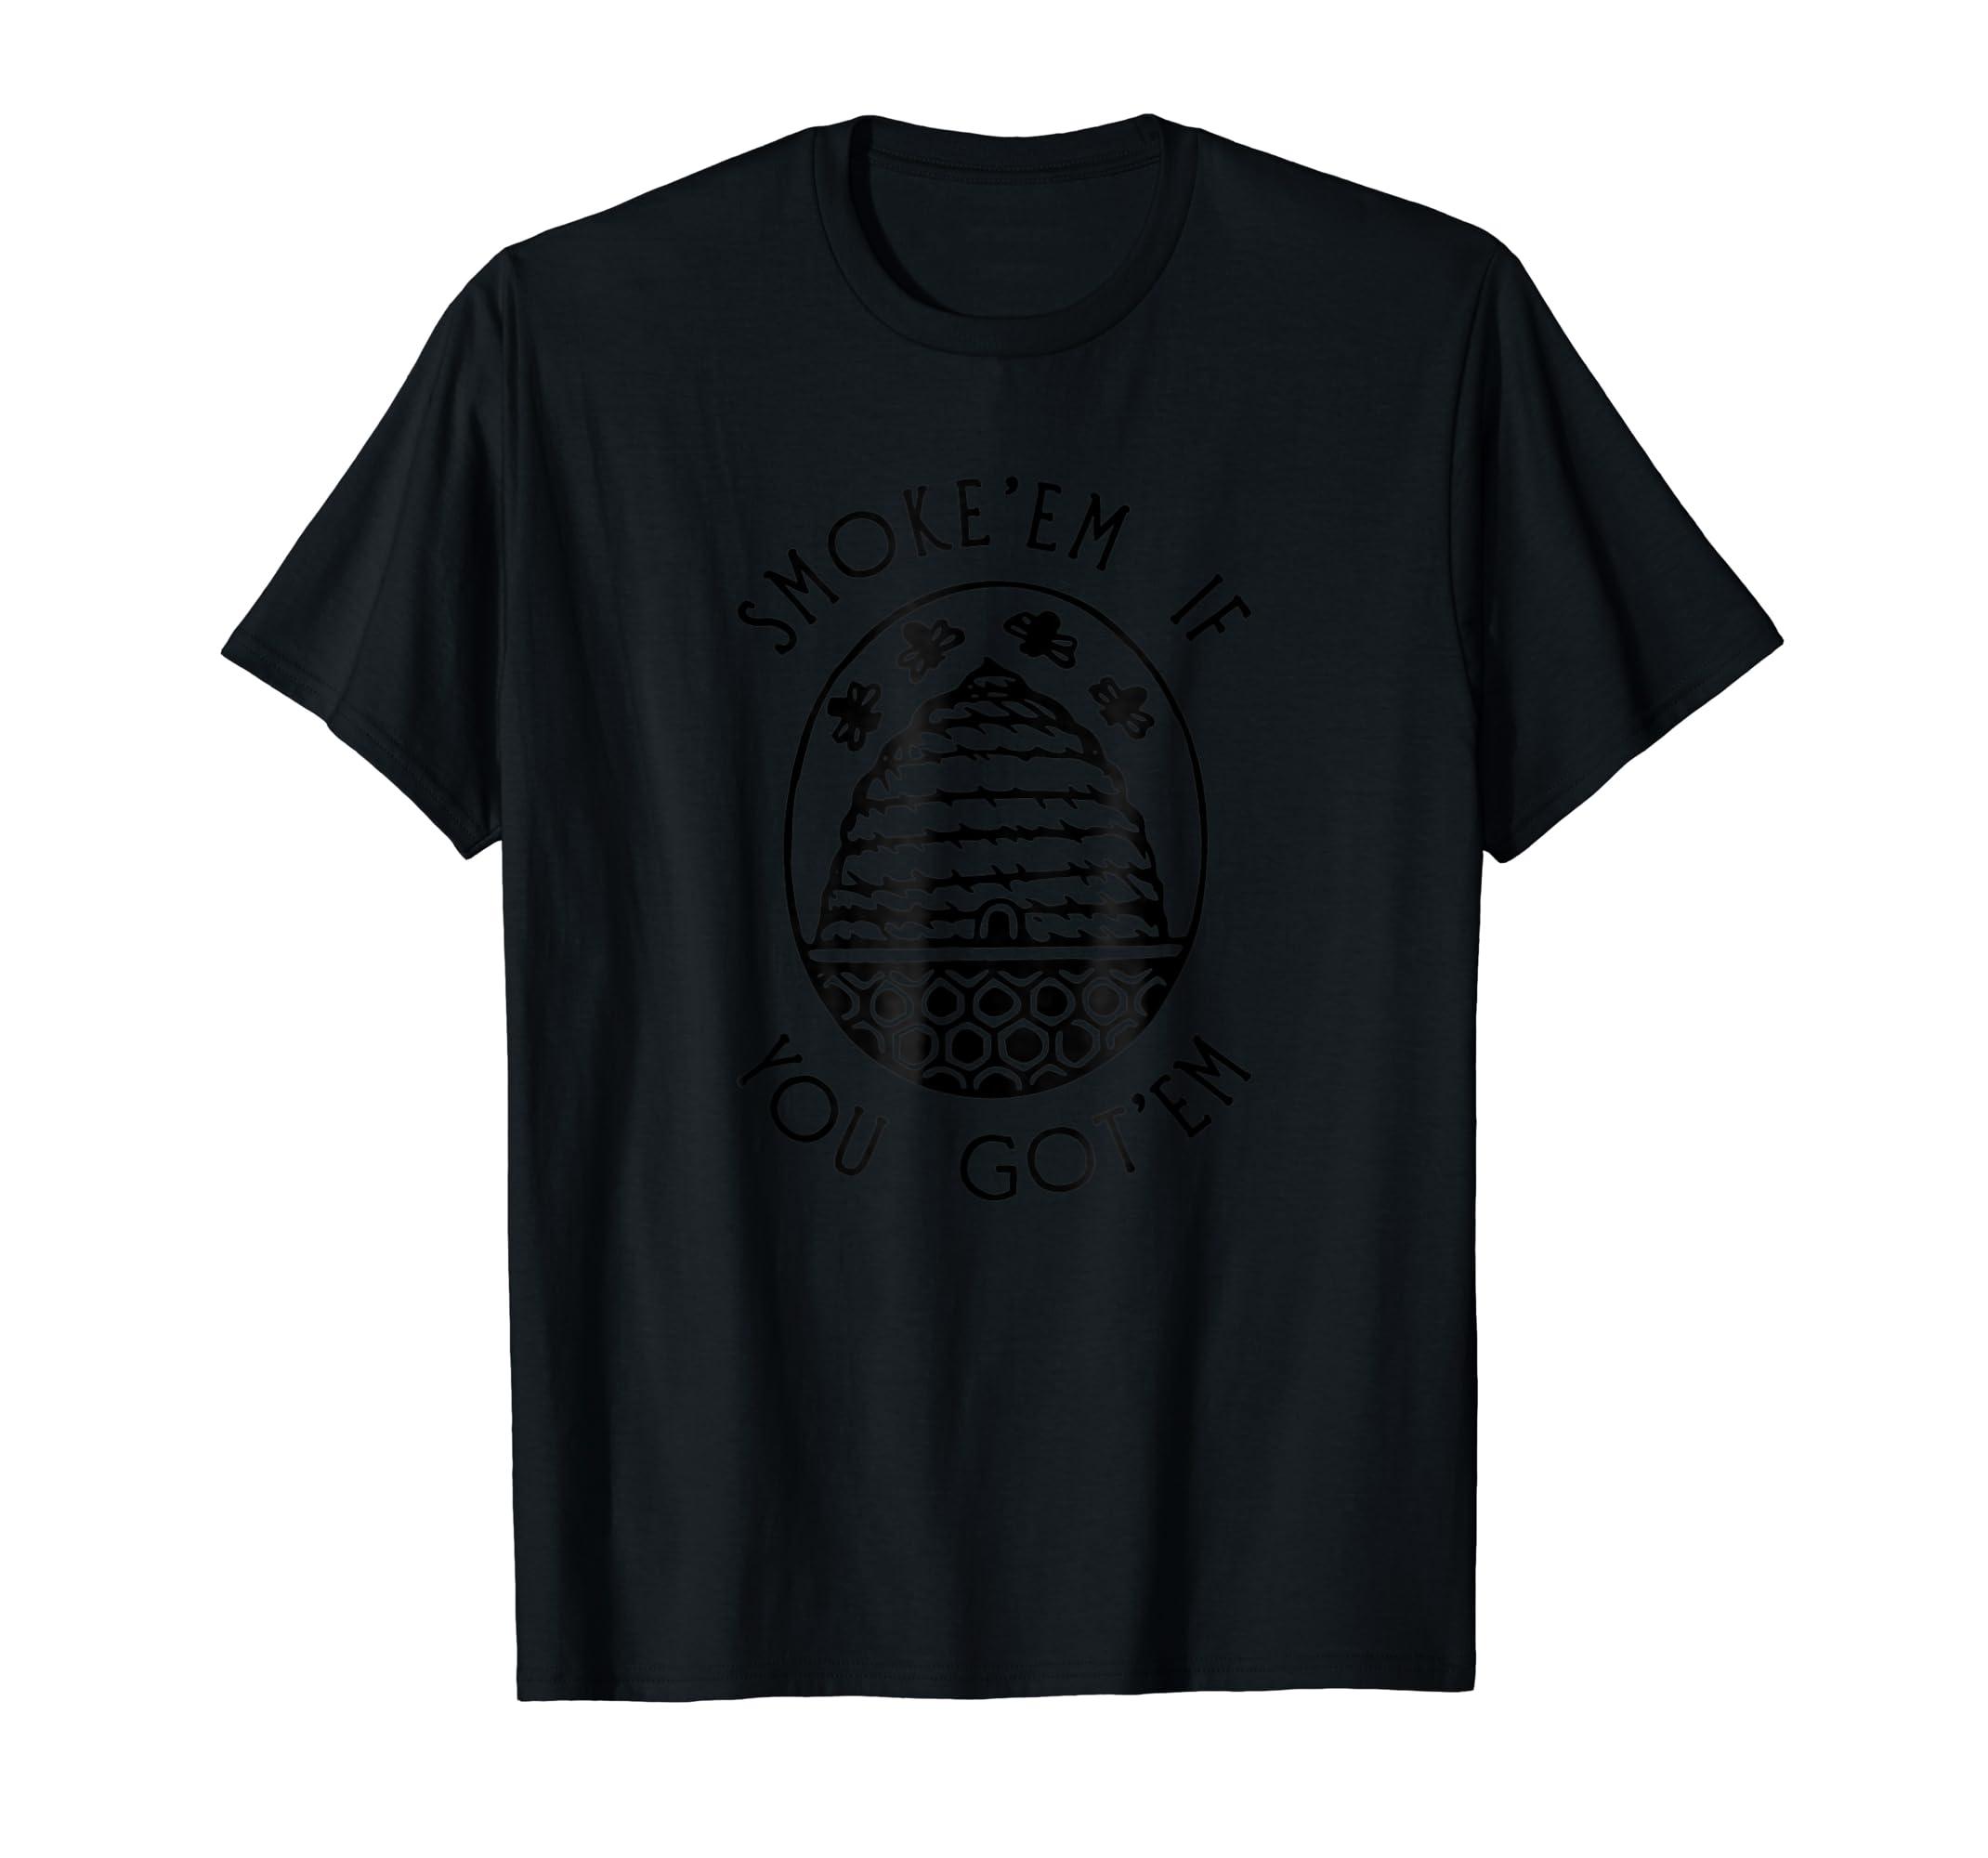 Funny Beekeeping Bee T Shirt, Smoke Them Honey Bees Tee Gift-Men's T-Shirt-Black